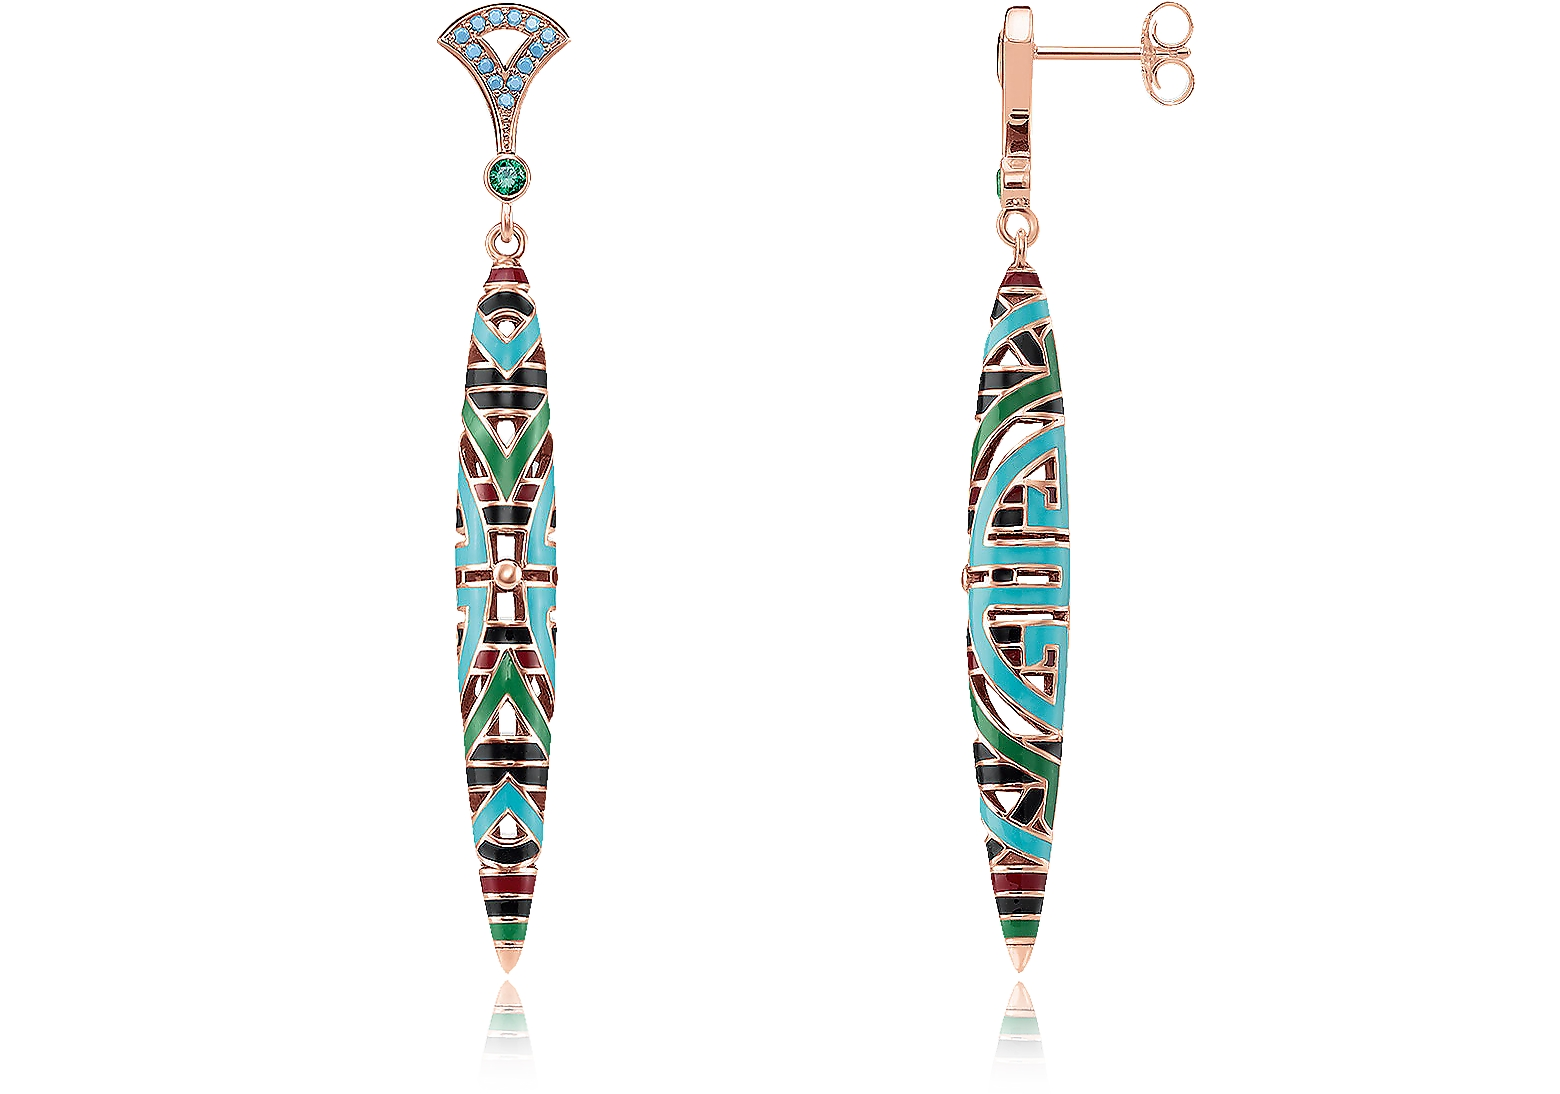 18k Rose Gold Plated Sterling silver Long Earrings w/Glass-ceramic stones